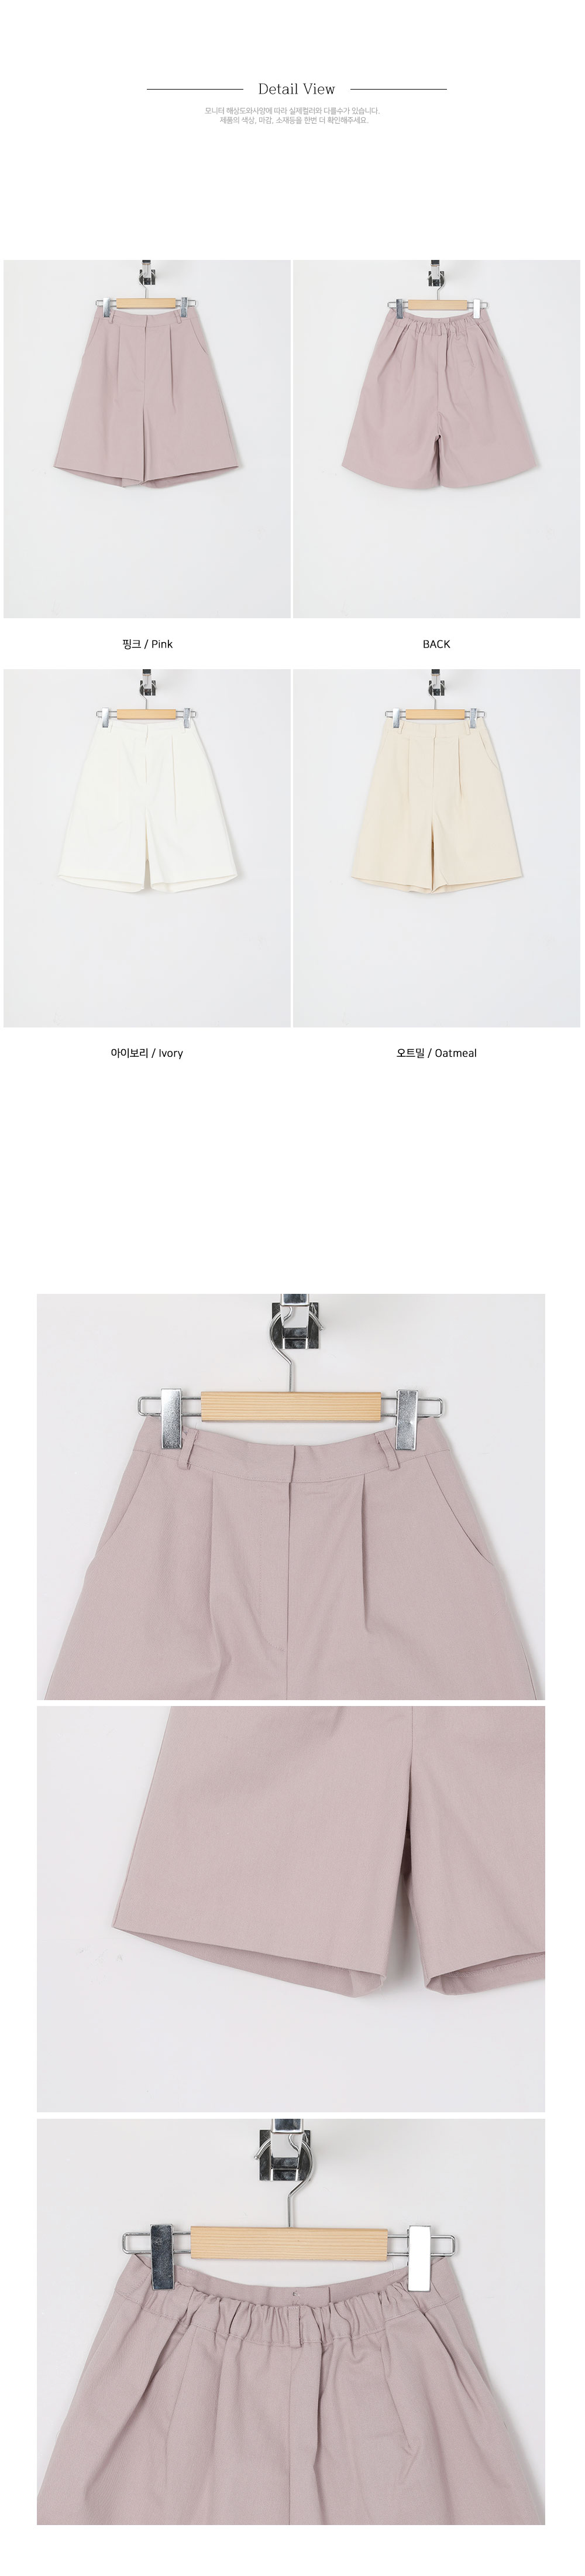 Beth pintuck half pants